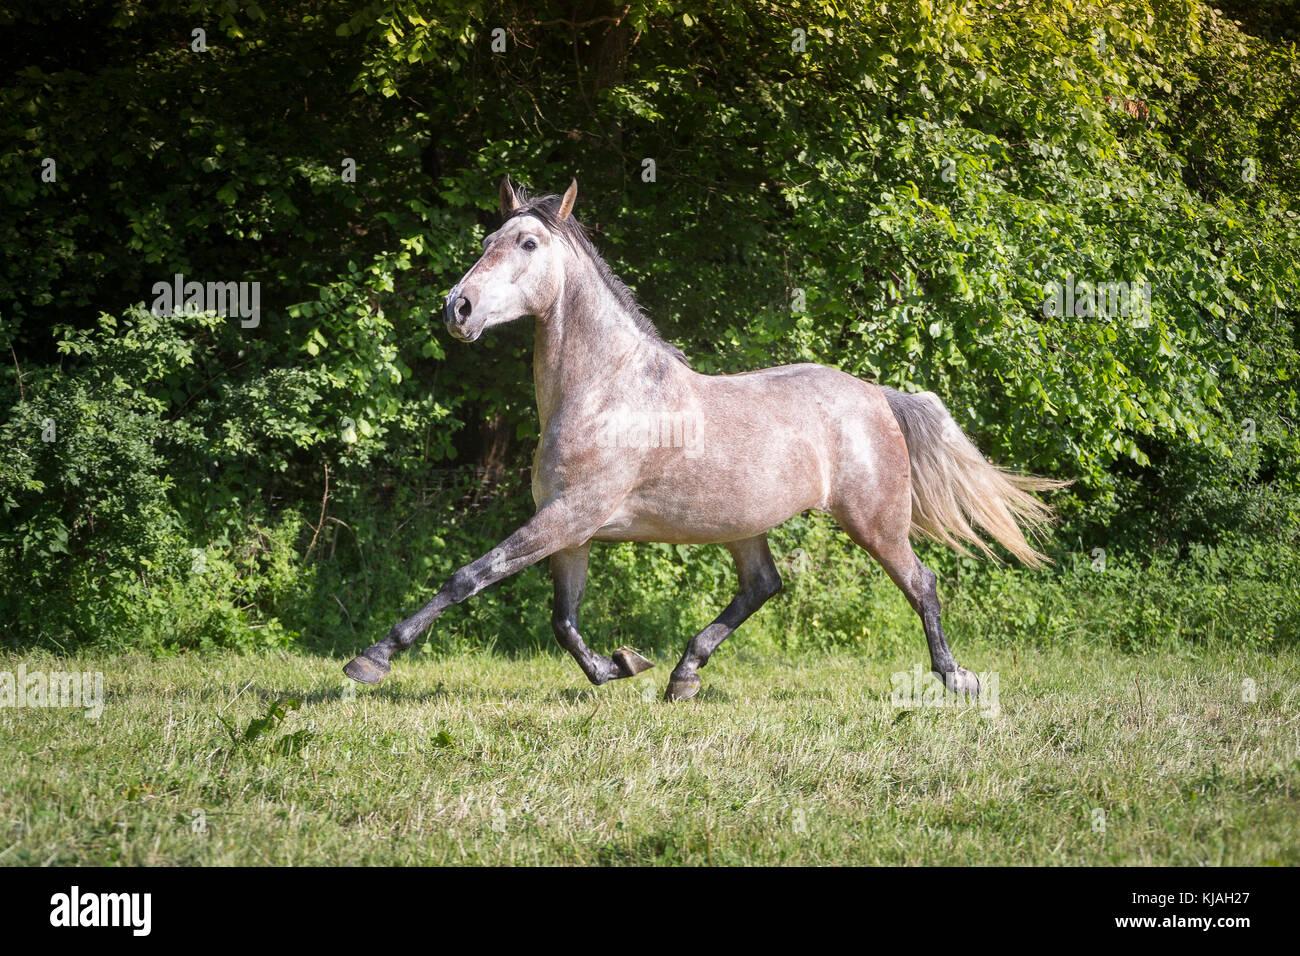 Strawberry Roan Horse Stock Photos & Strawberry Roan Horse ... - photo#21